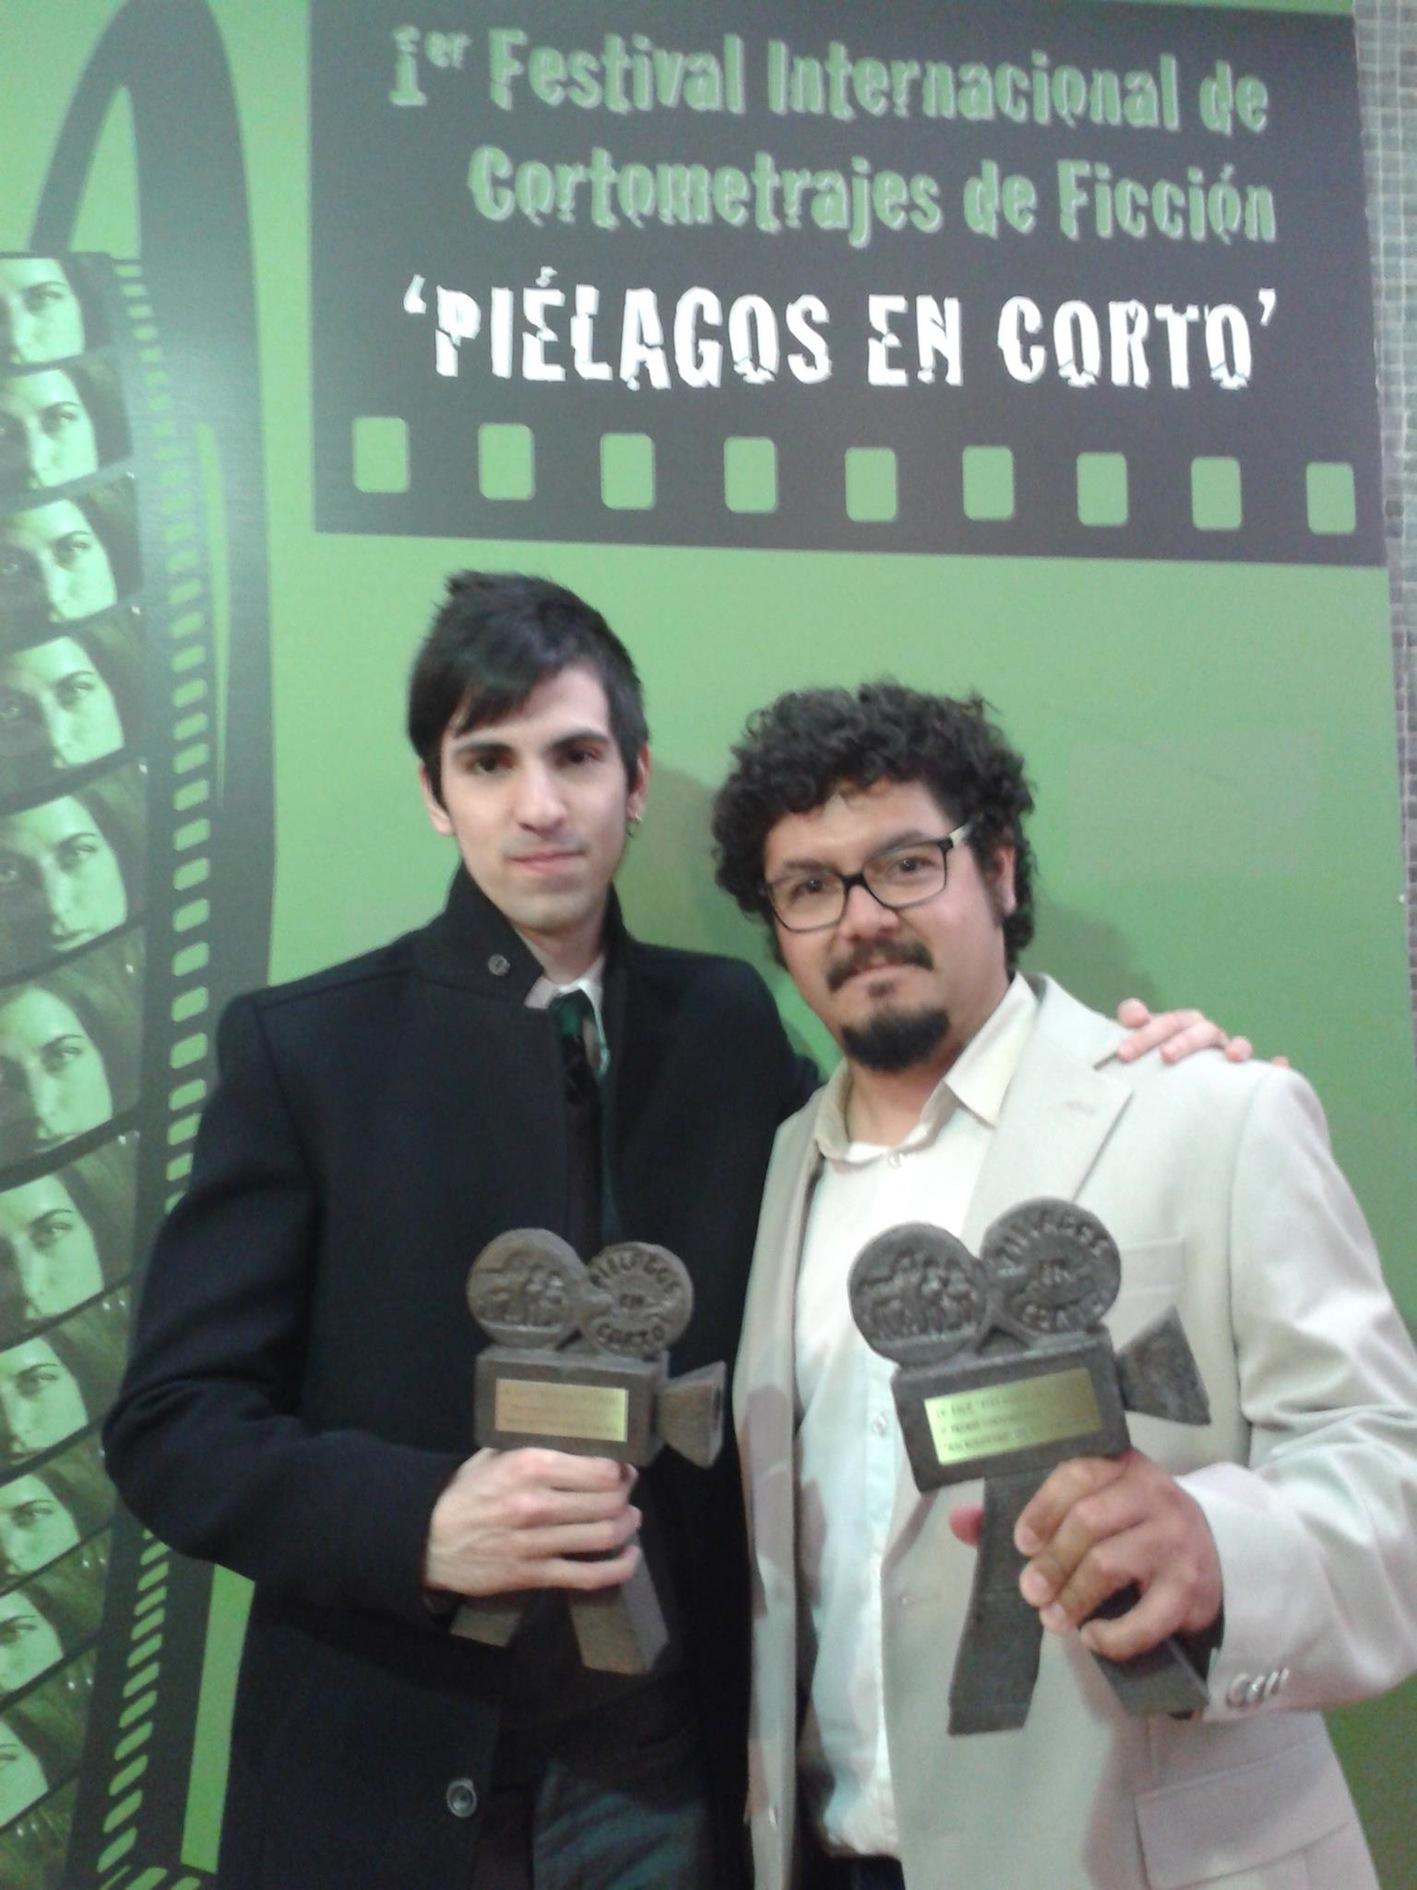 Piélagos en Corto Film Festival